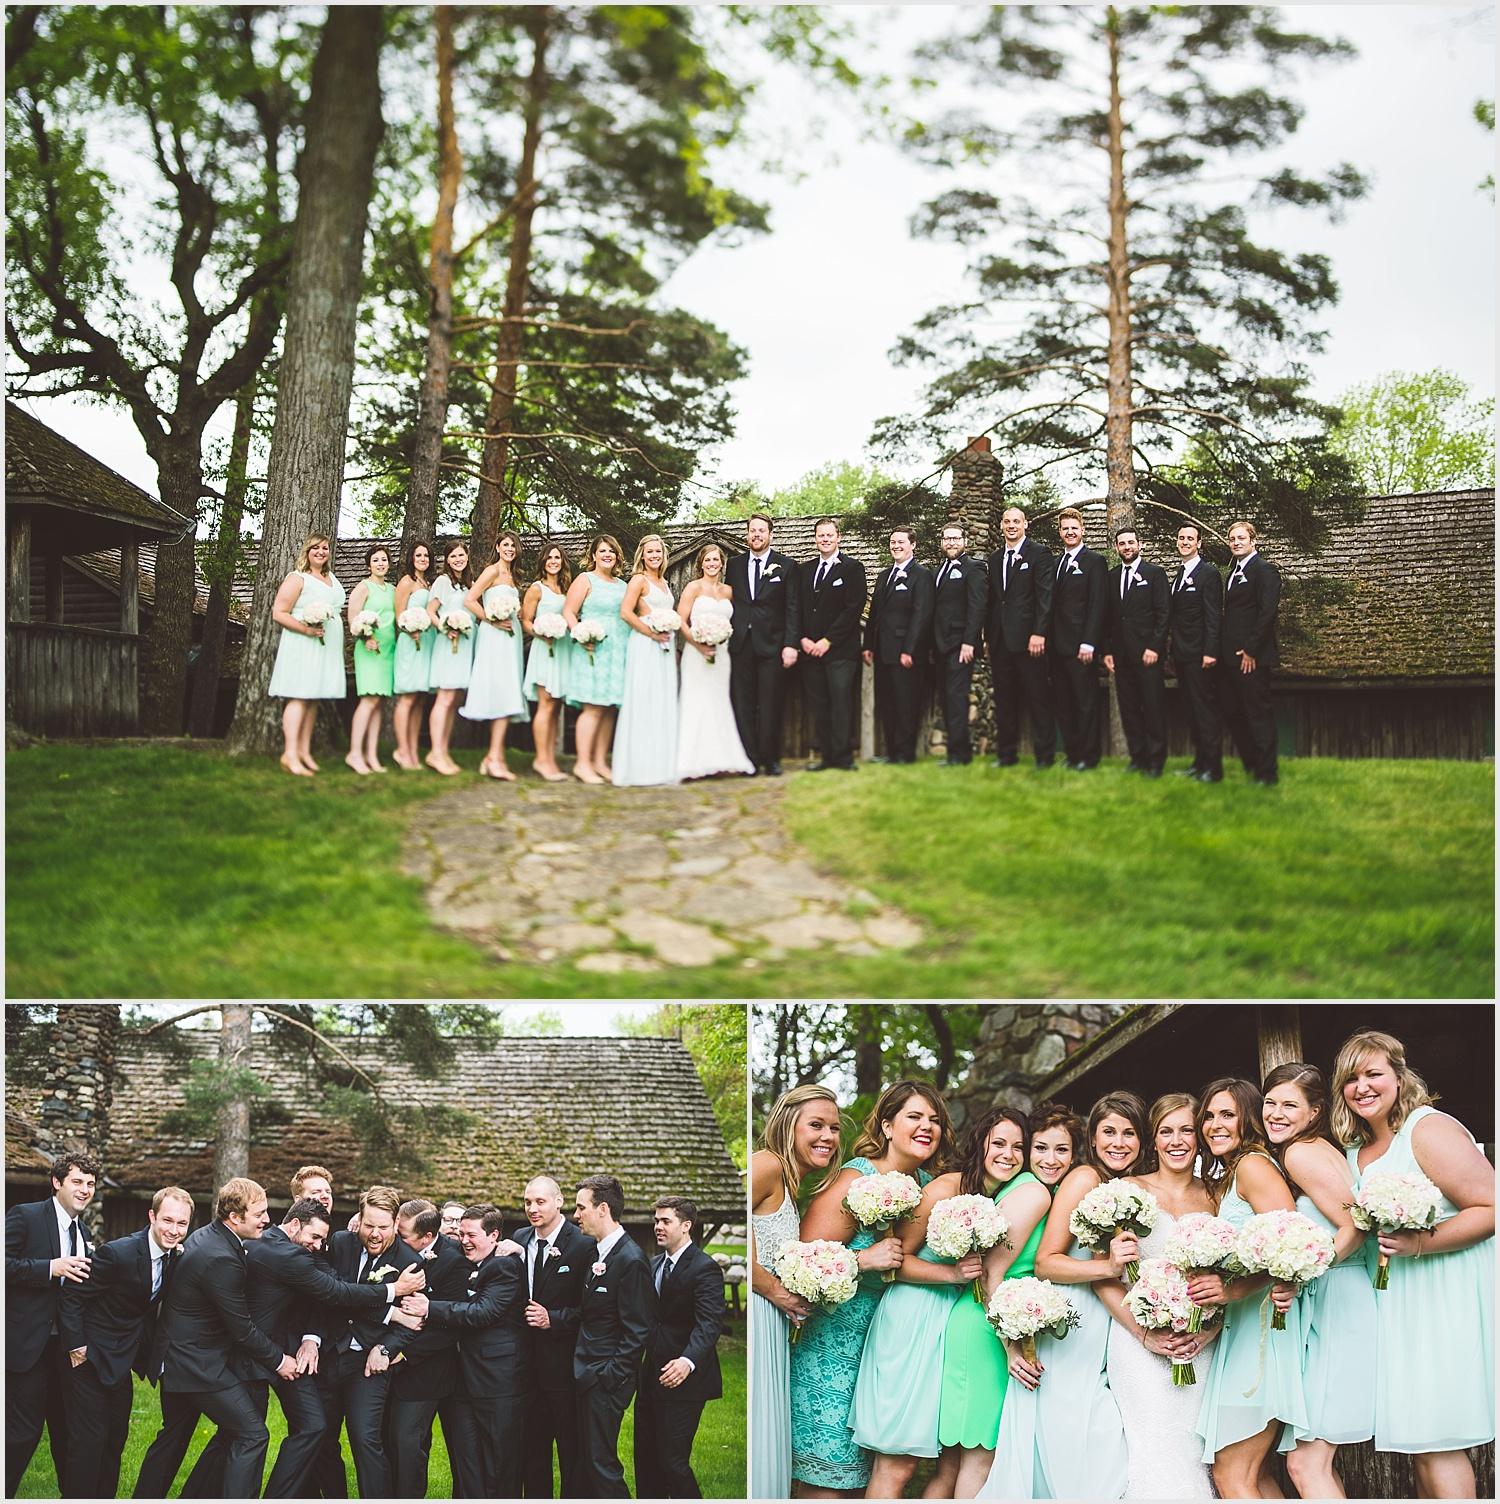 Old_Log_Theater_Minnetonka_wedding_photo_minneapolis_by_lucas_botz_photography_14.jpg